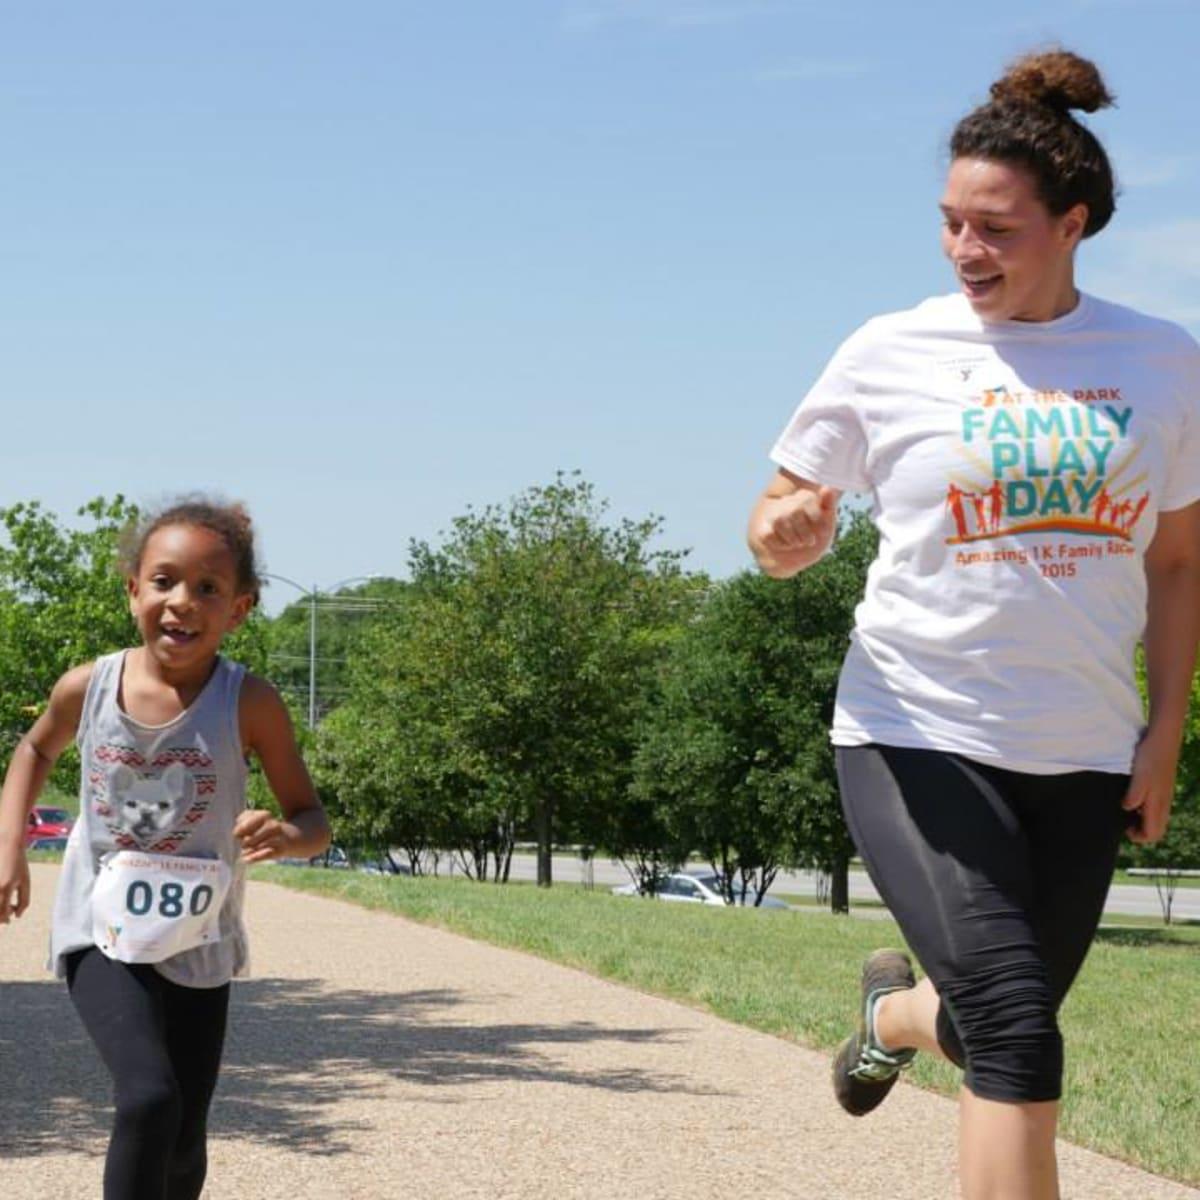 YMCA Family Play Day